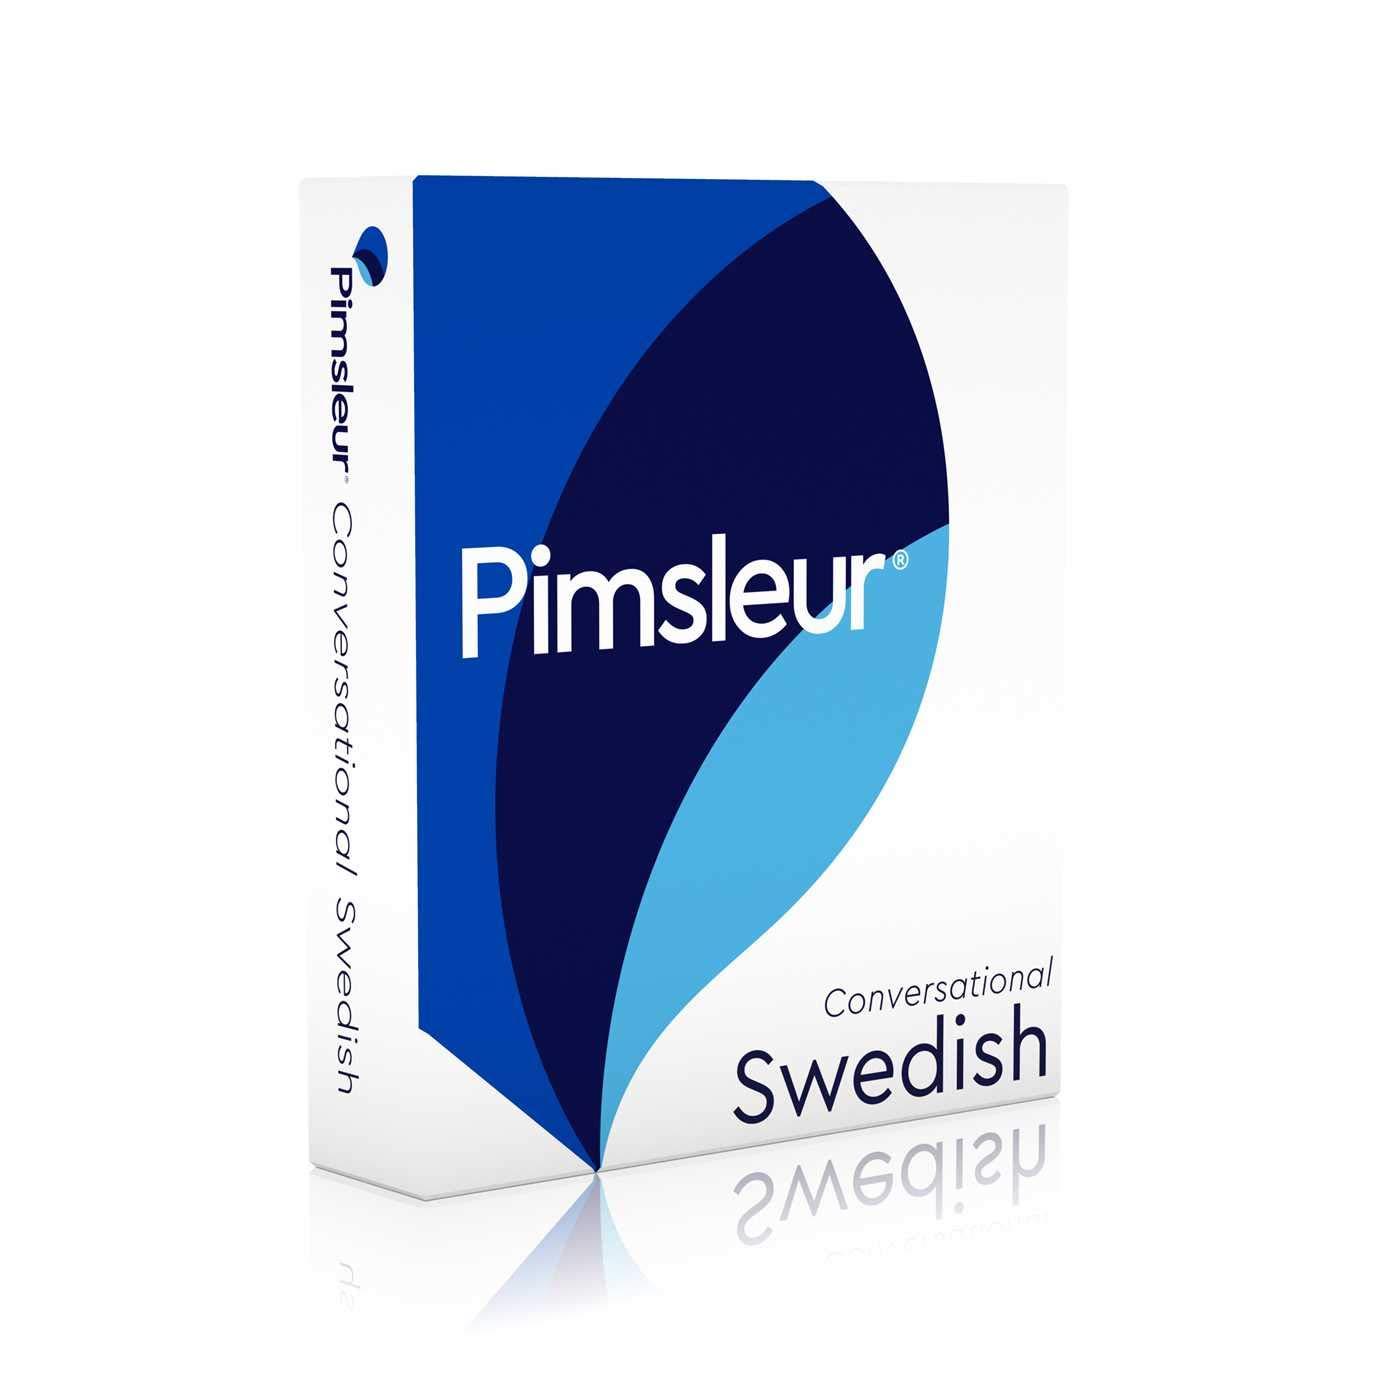 Pimsleur Swedish Conversational Course Understand